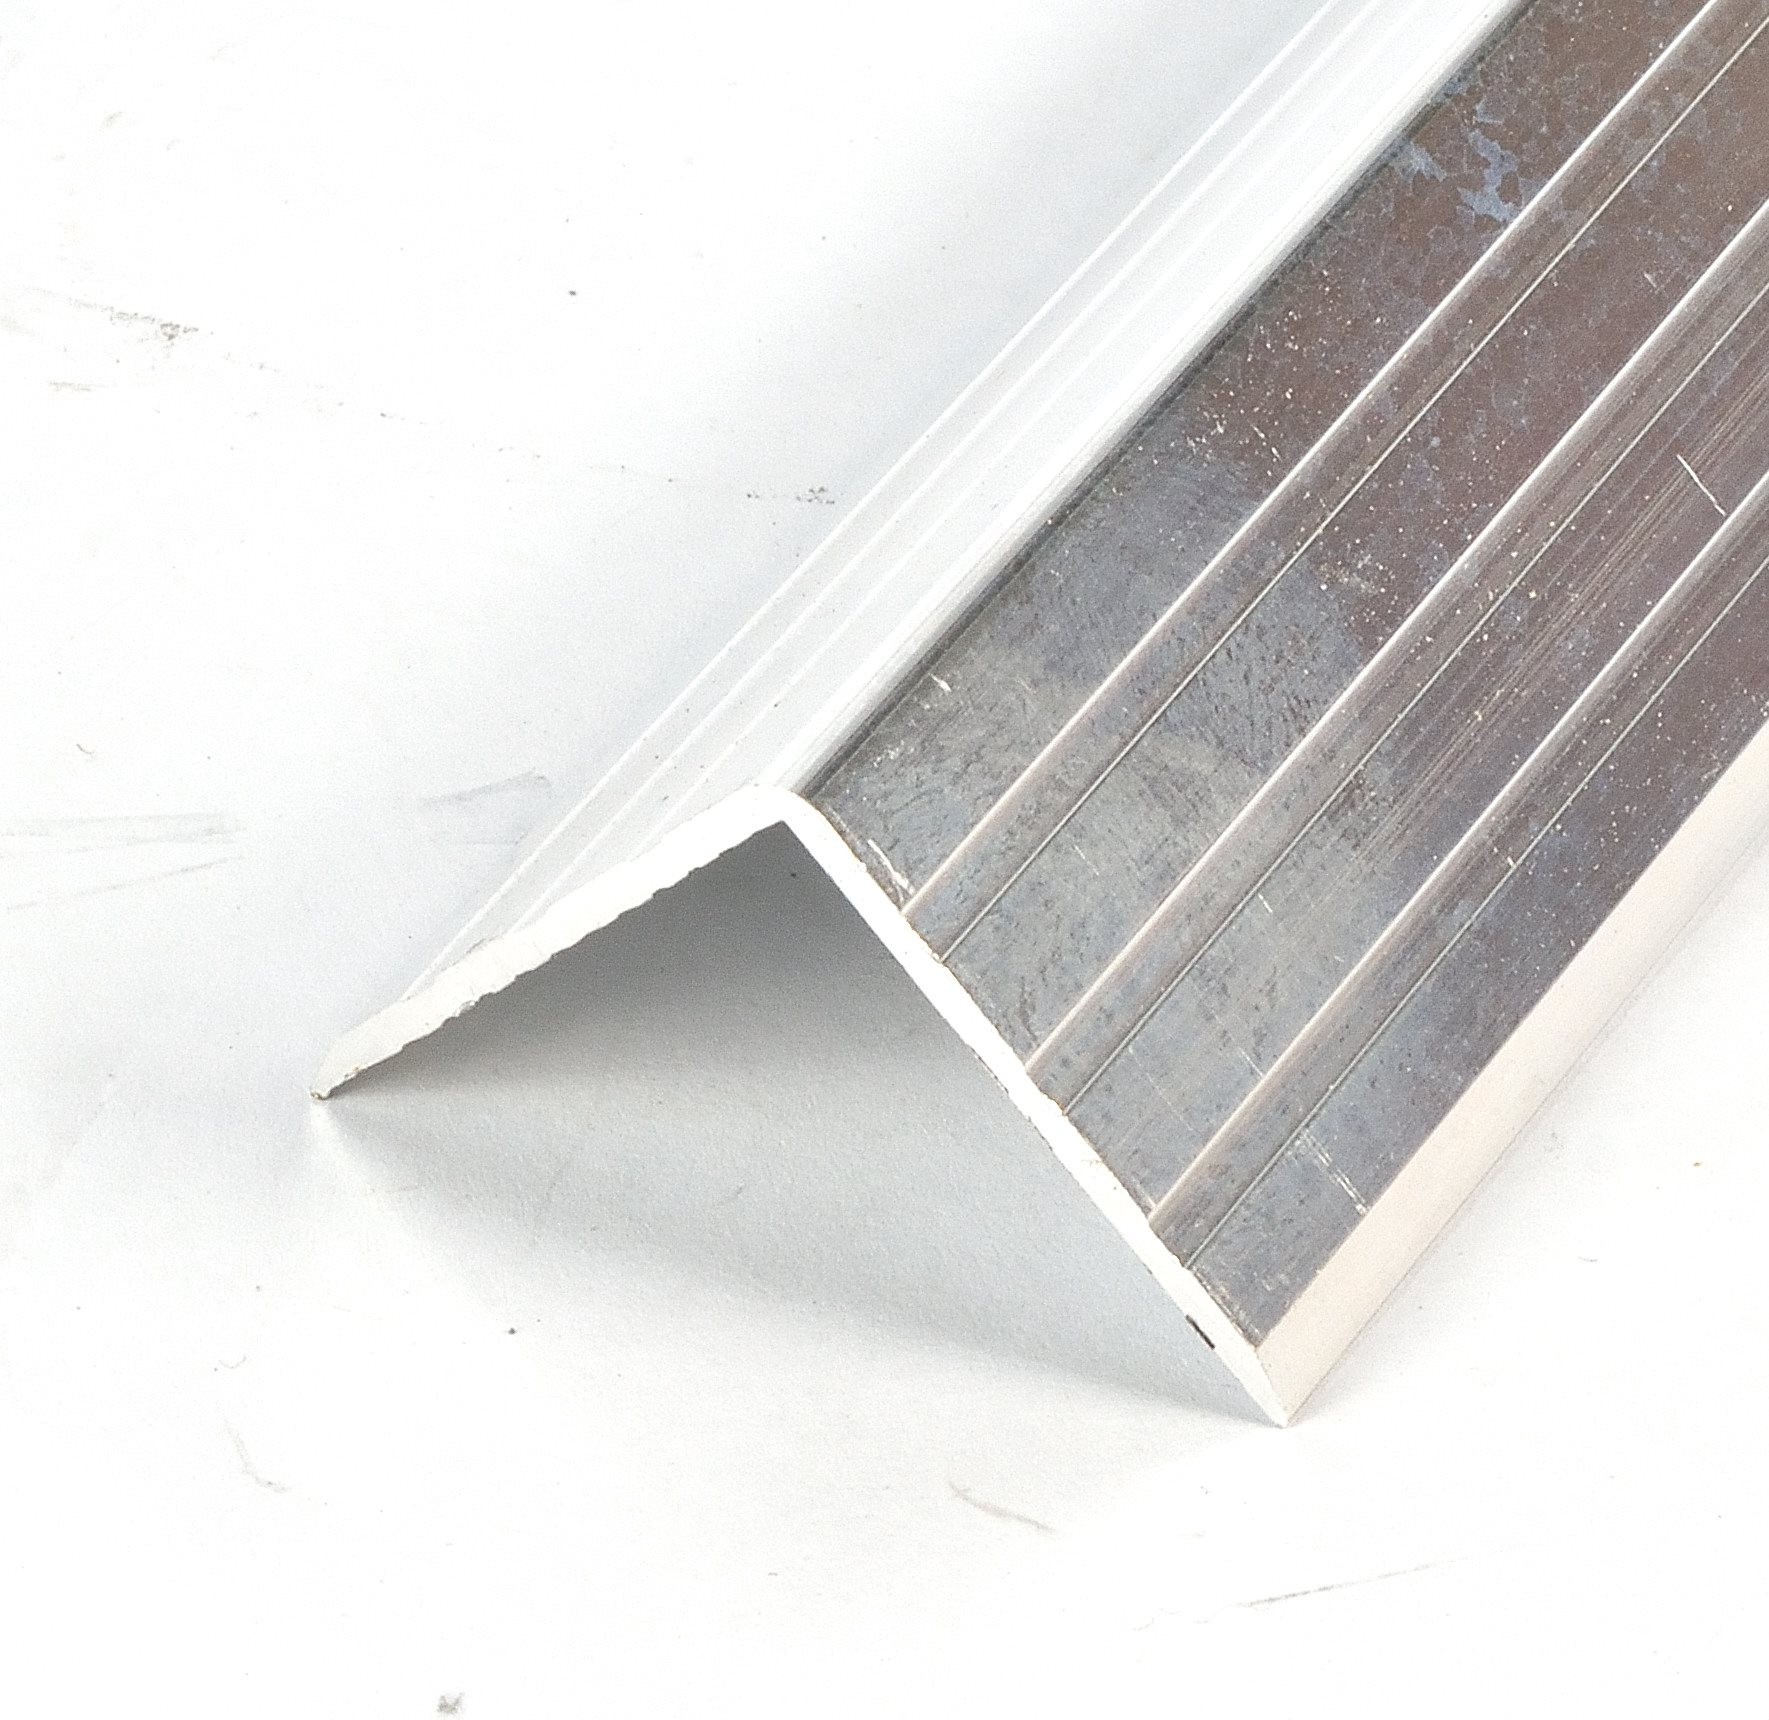 Kantenschutz 30x30x1 5mm aluminium winkelprofil 13890 for Fenetre 30 x 30